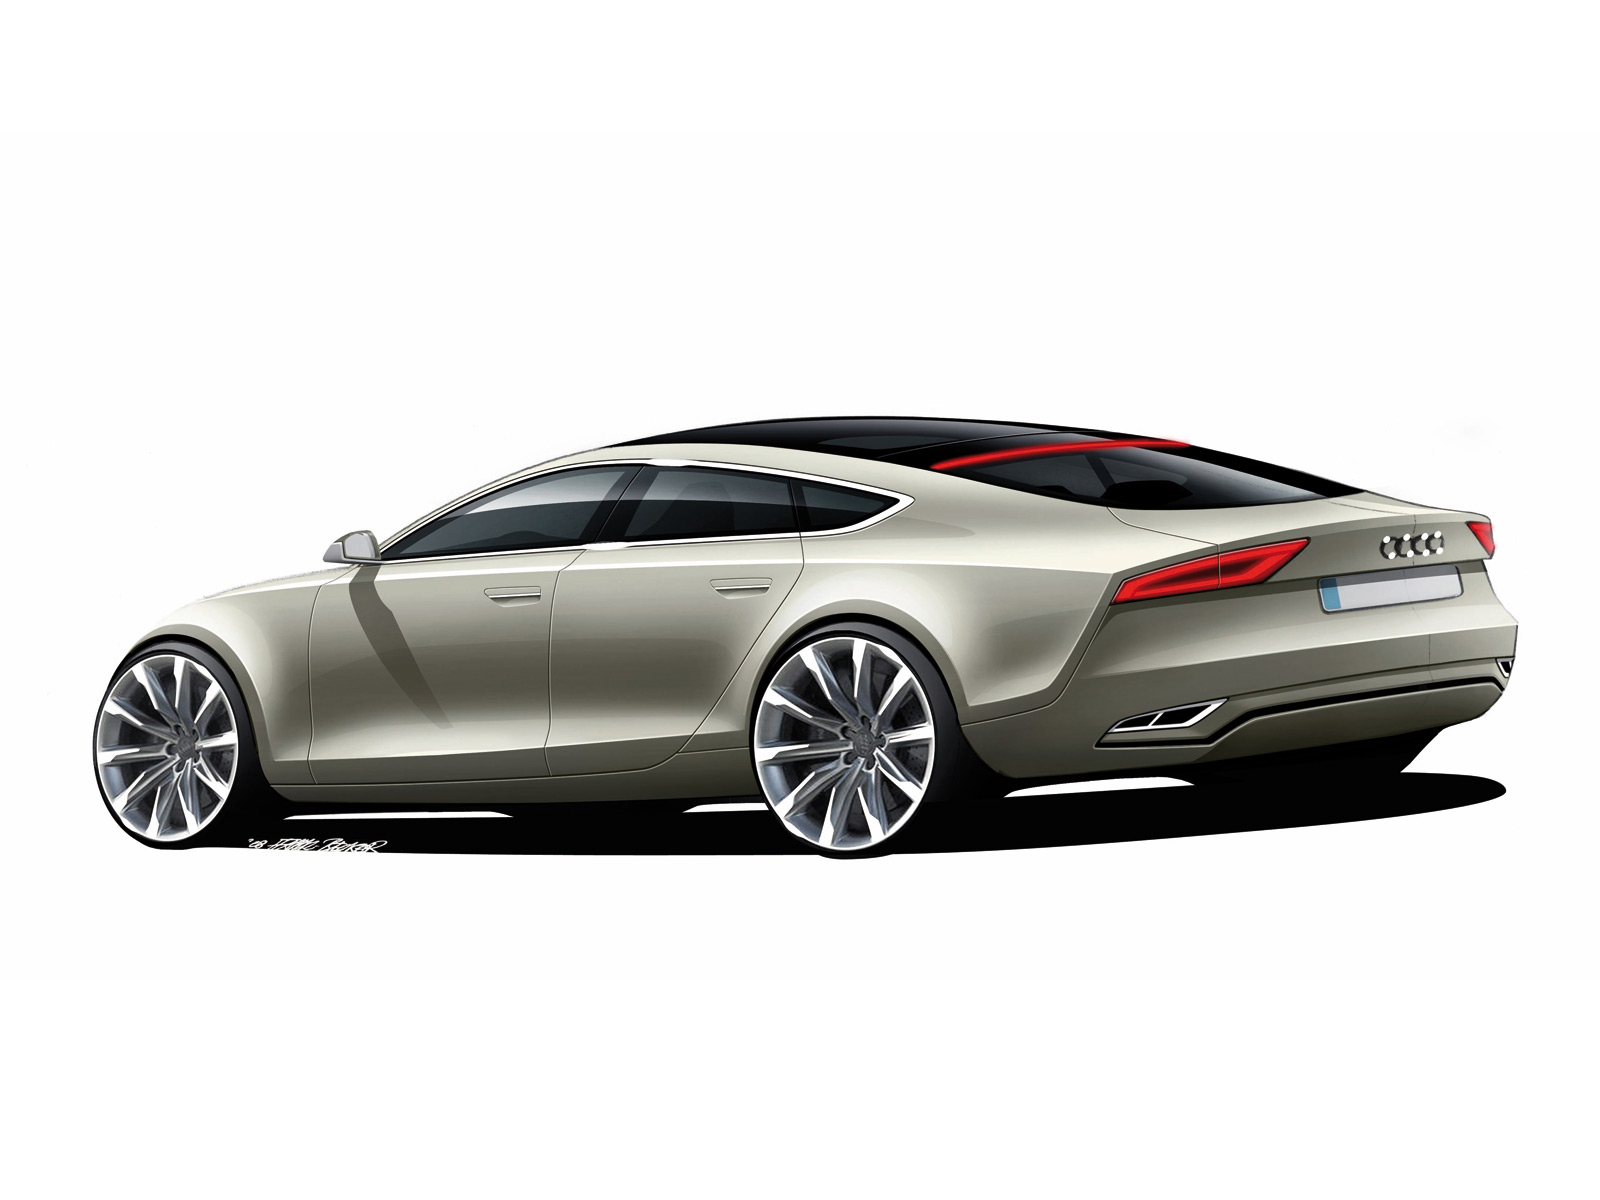 2015 Audi A3 Sedan Rear Side View Photo 35: Jodesign Studio :: Audi Sportback Concept Design Sketch